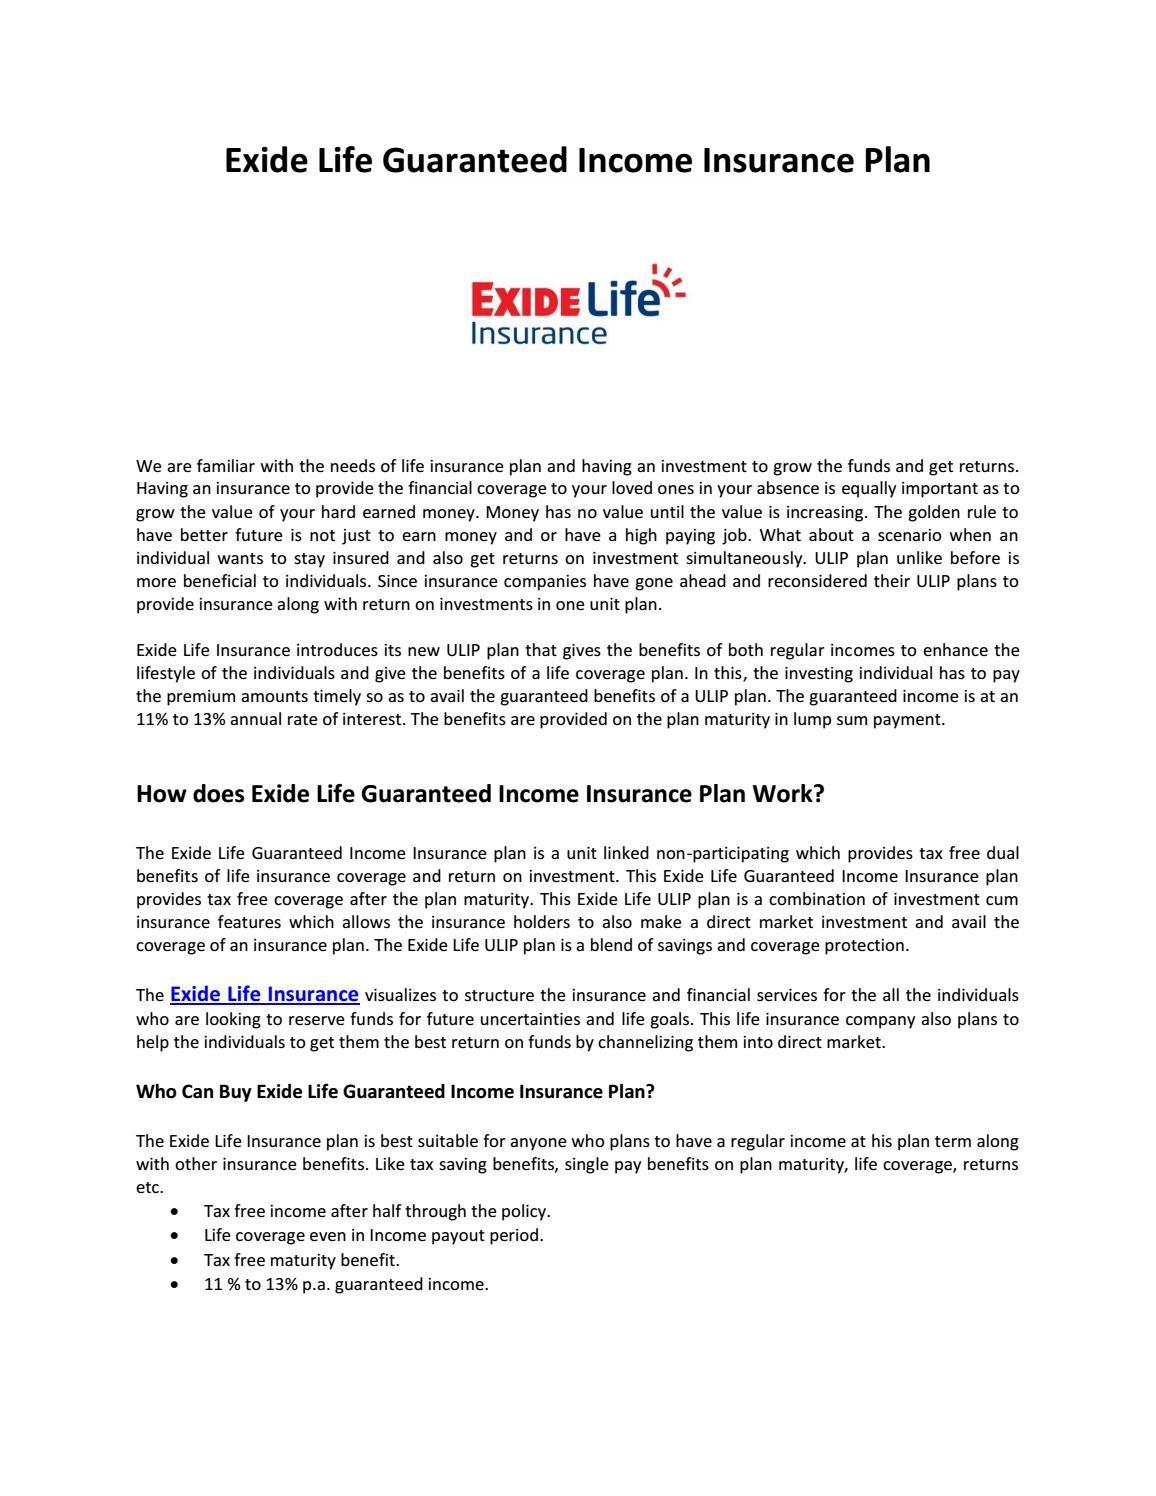 Guaranteed Income Ulip Plan From Exide Life Insurance Guaranteed